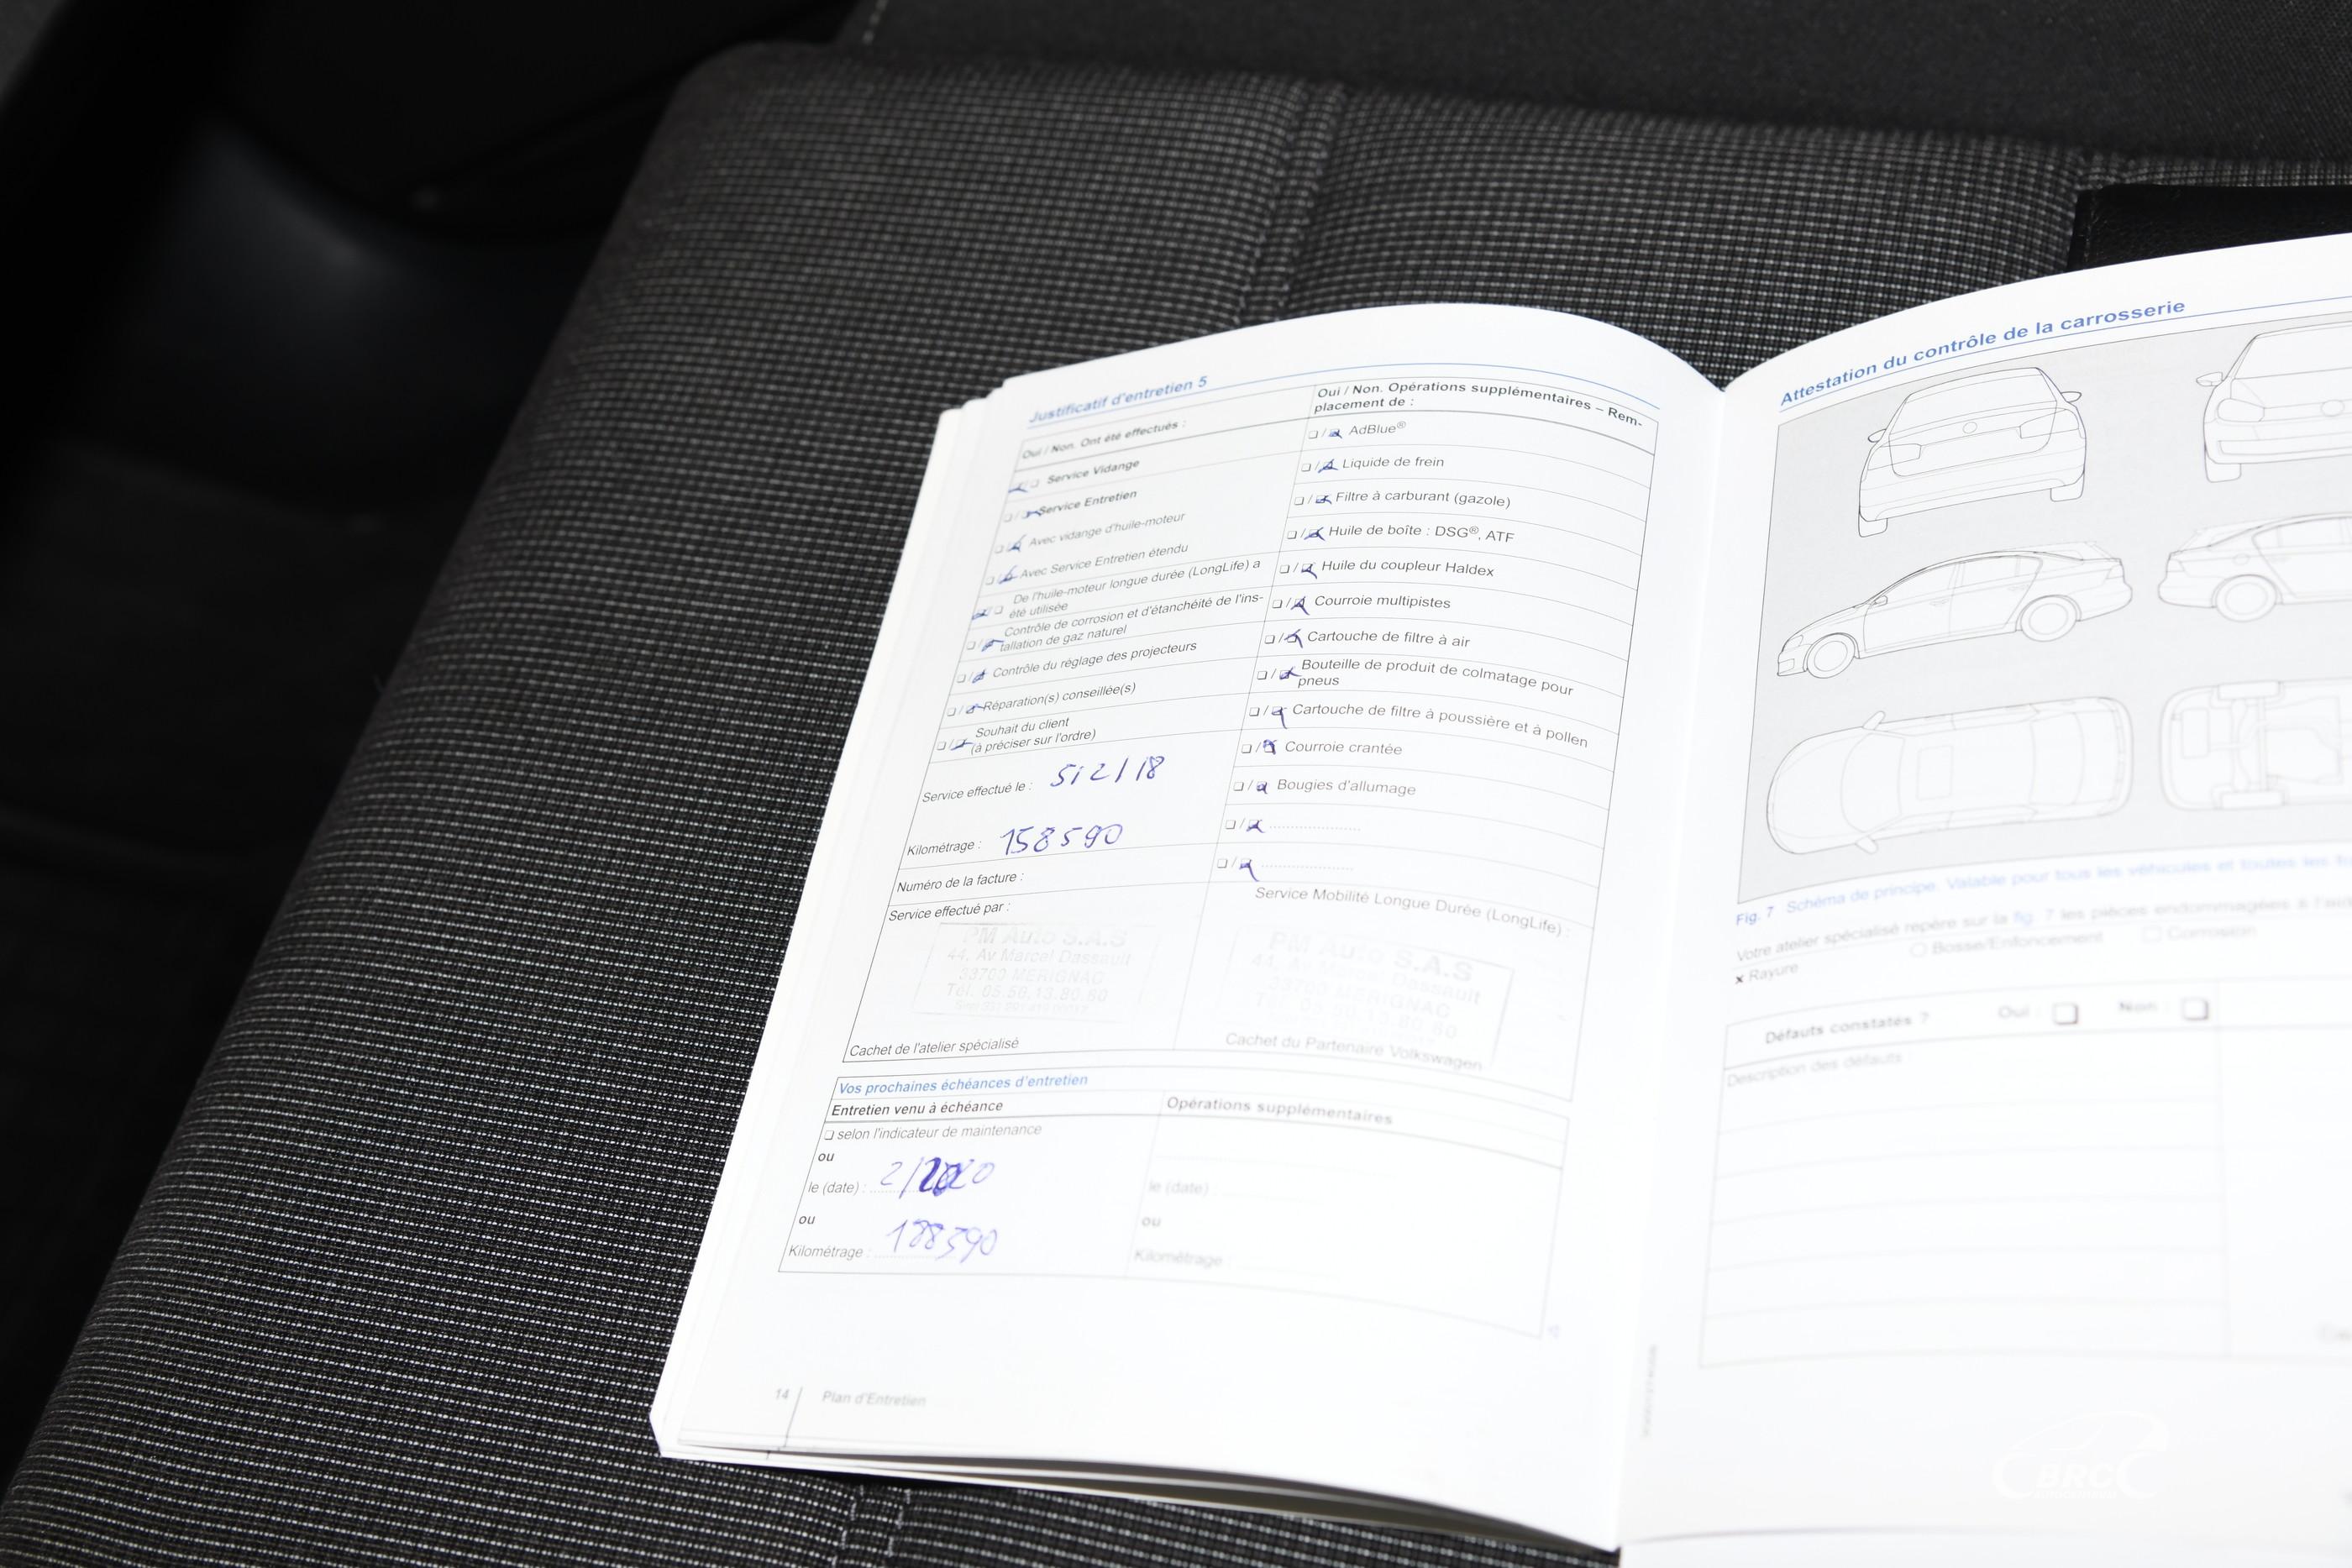 Volkswagen Passat 2.0 TDI Variant Automatas